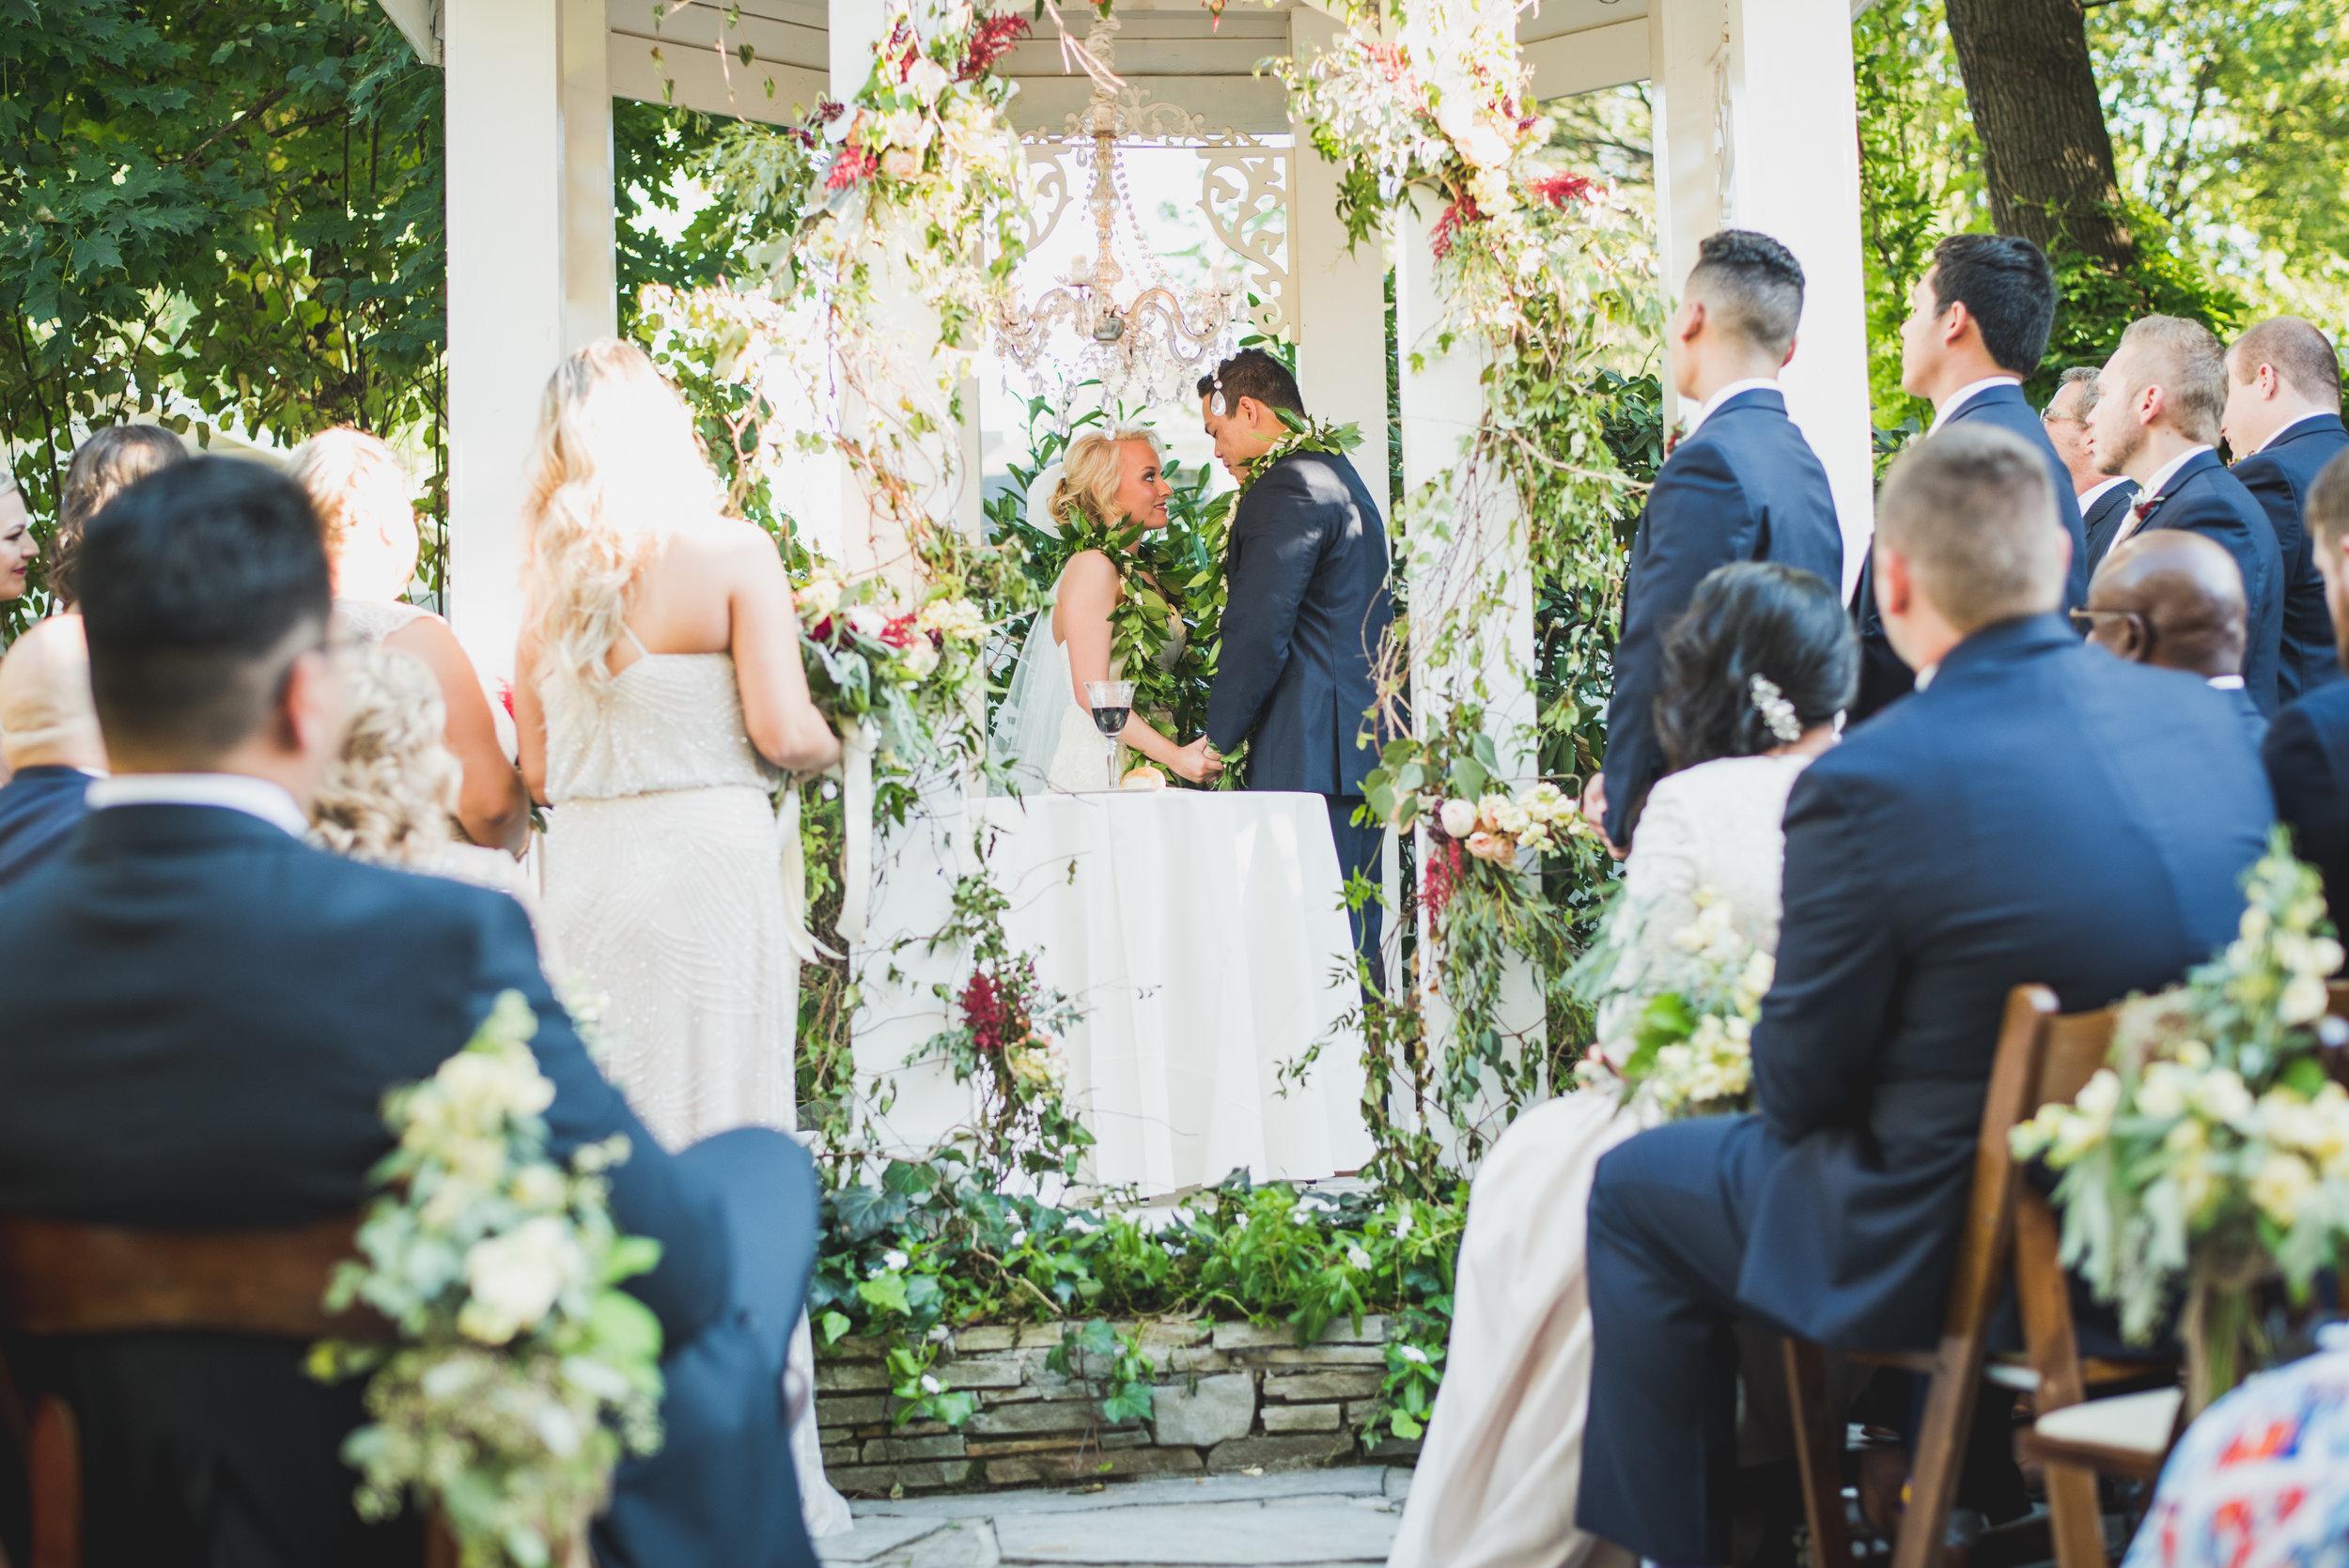 Nashville-wedding-photographers-CJ's-Off-The-Square-32.JPG